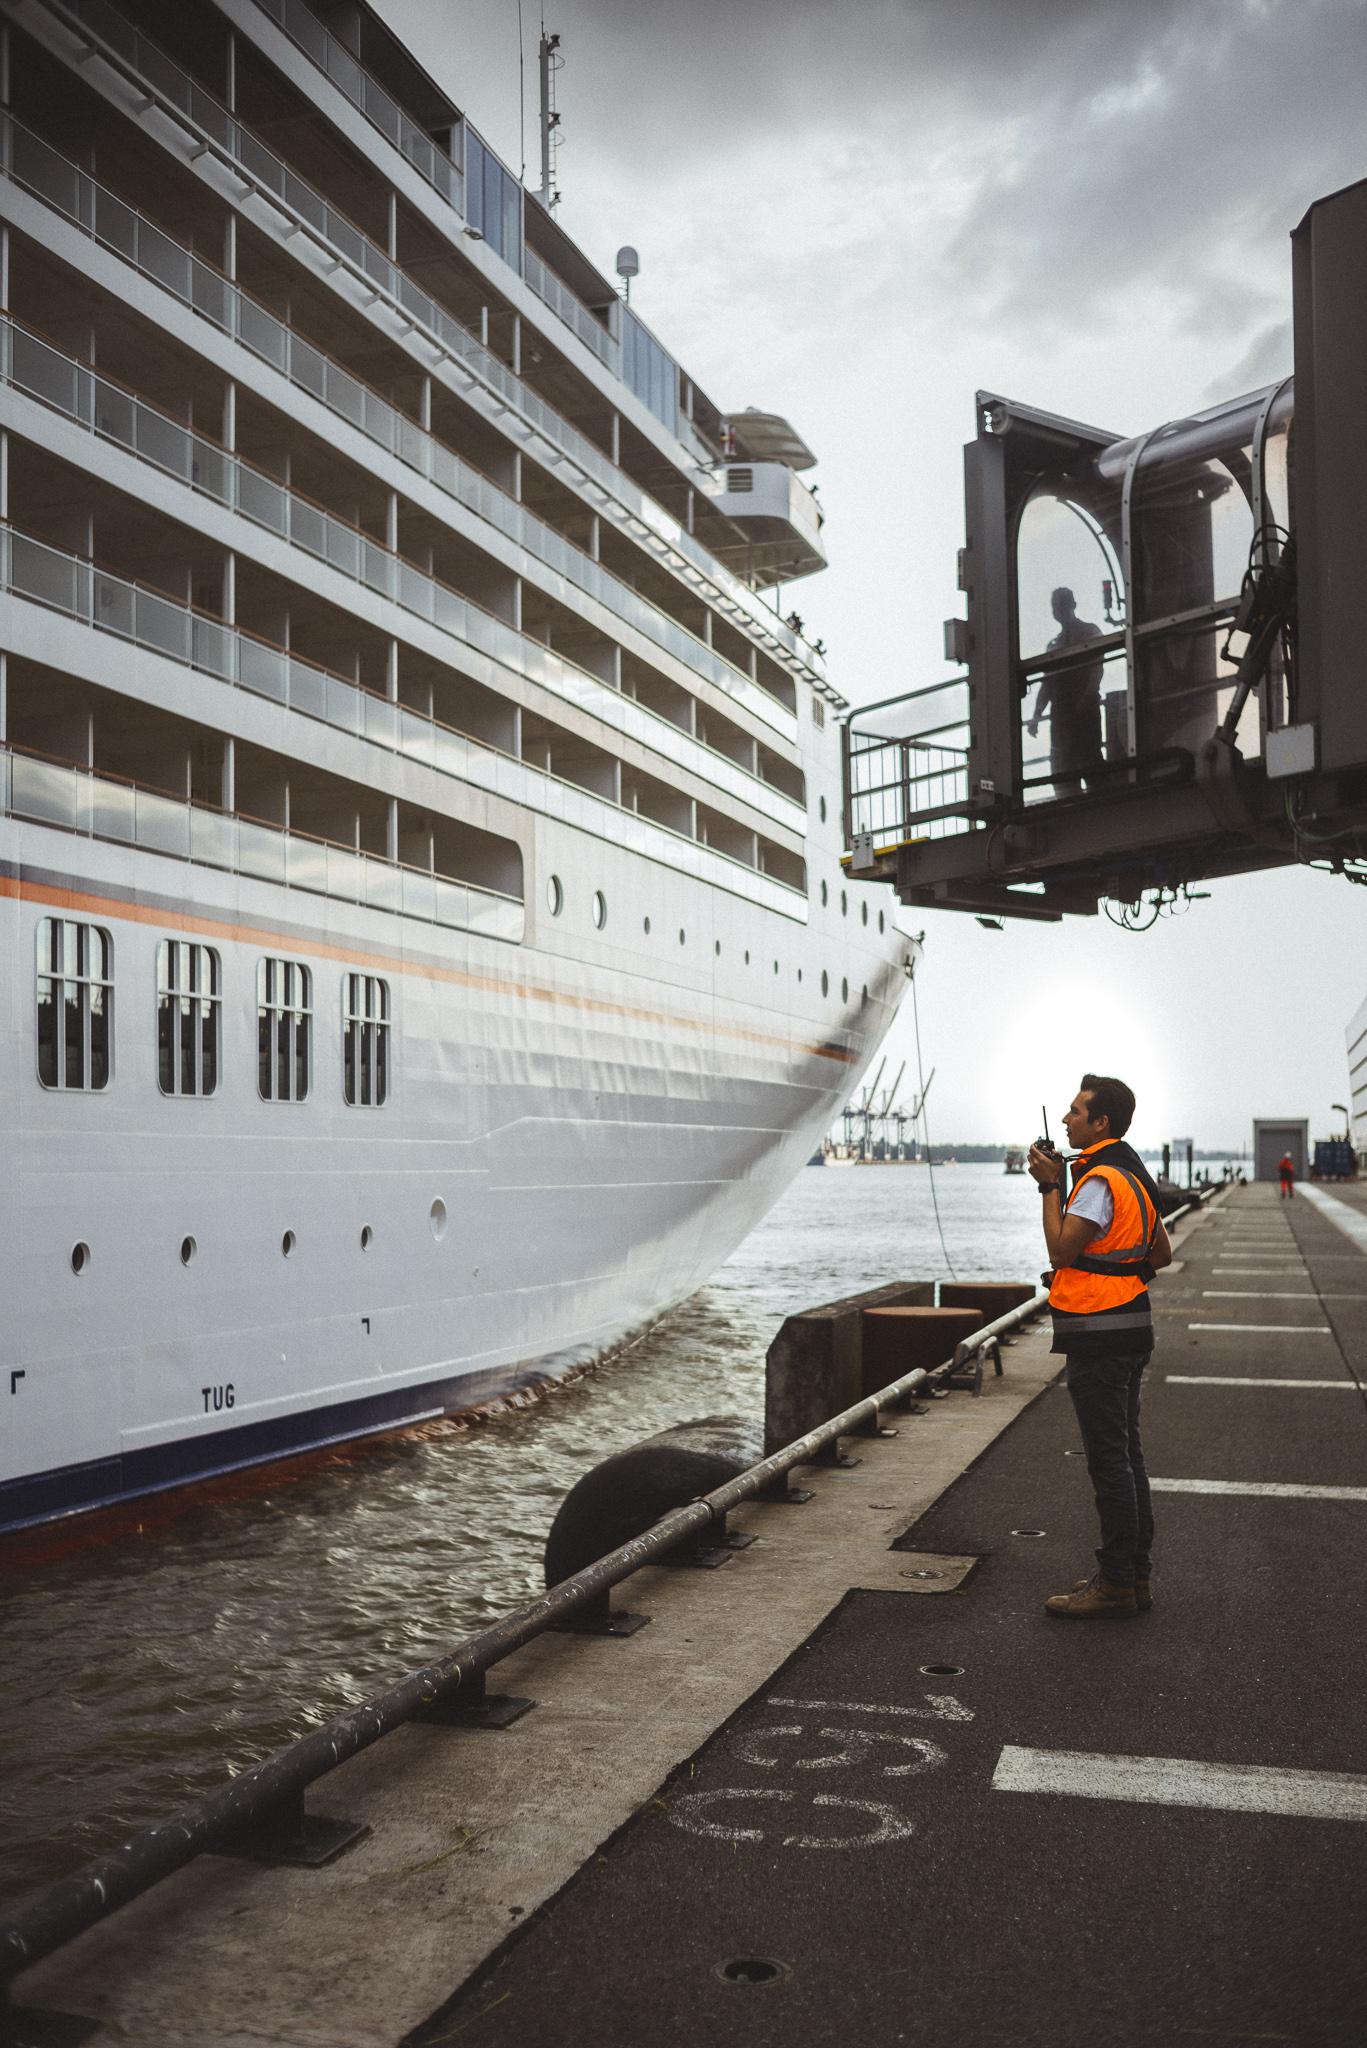 lockdown hamburg - rebooting society - Cruise Center Hamburg - Arbeitswelten - Martin Foddanu Photography